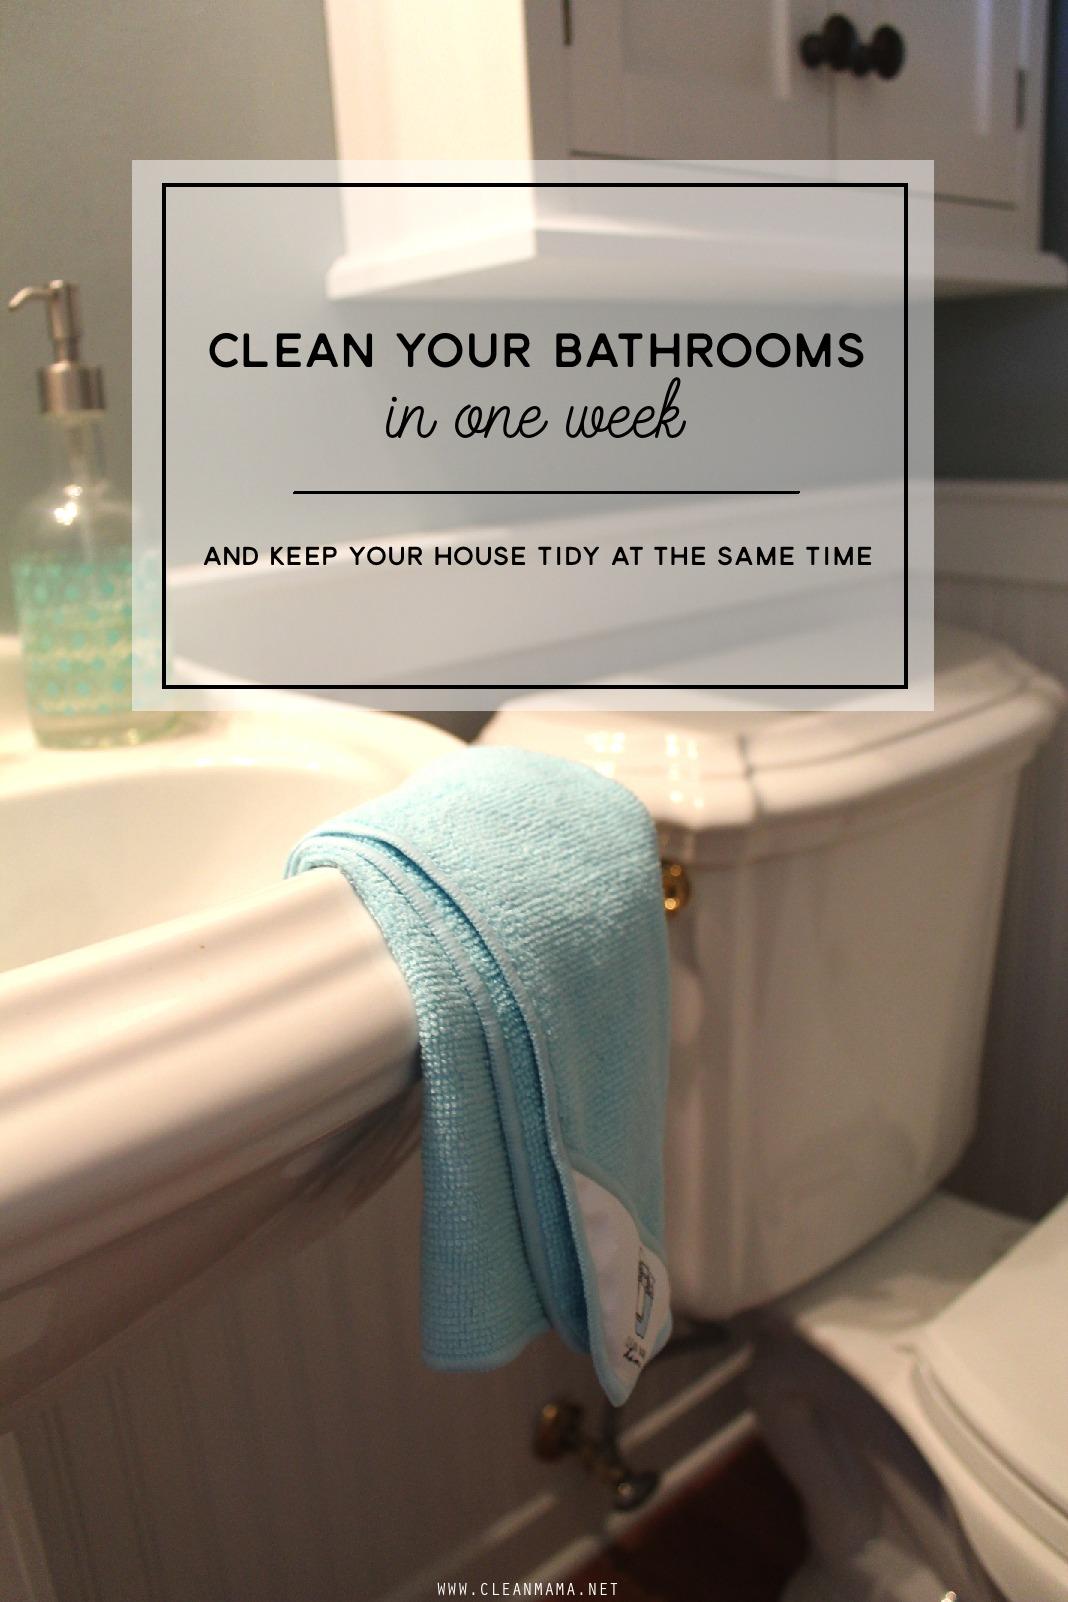 come clean challenge - week 3 - bathrooms